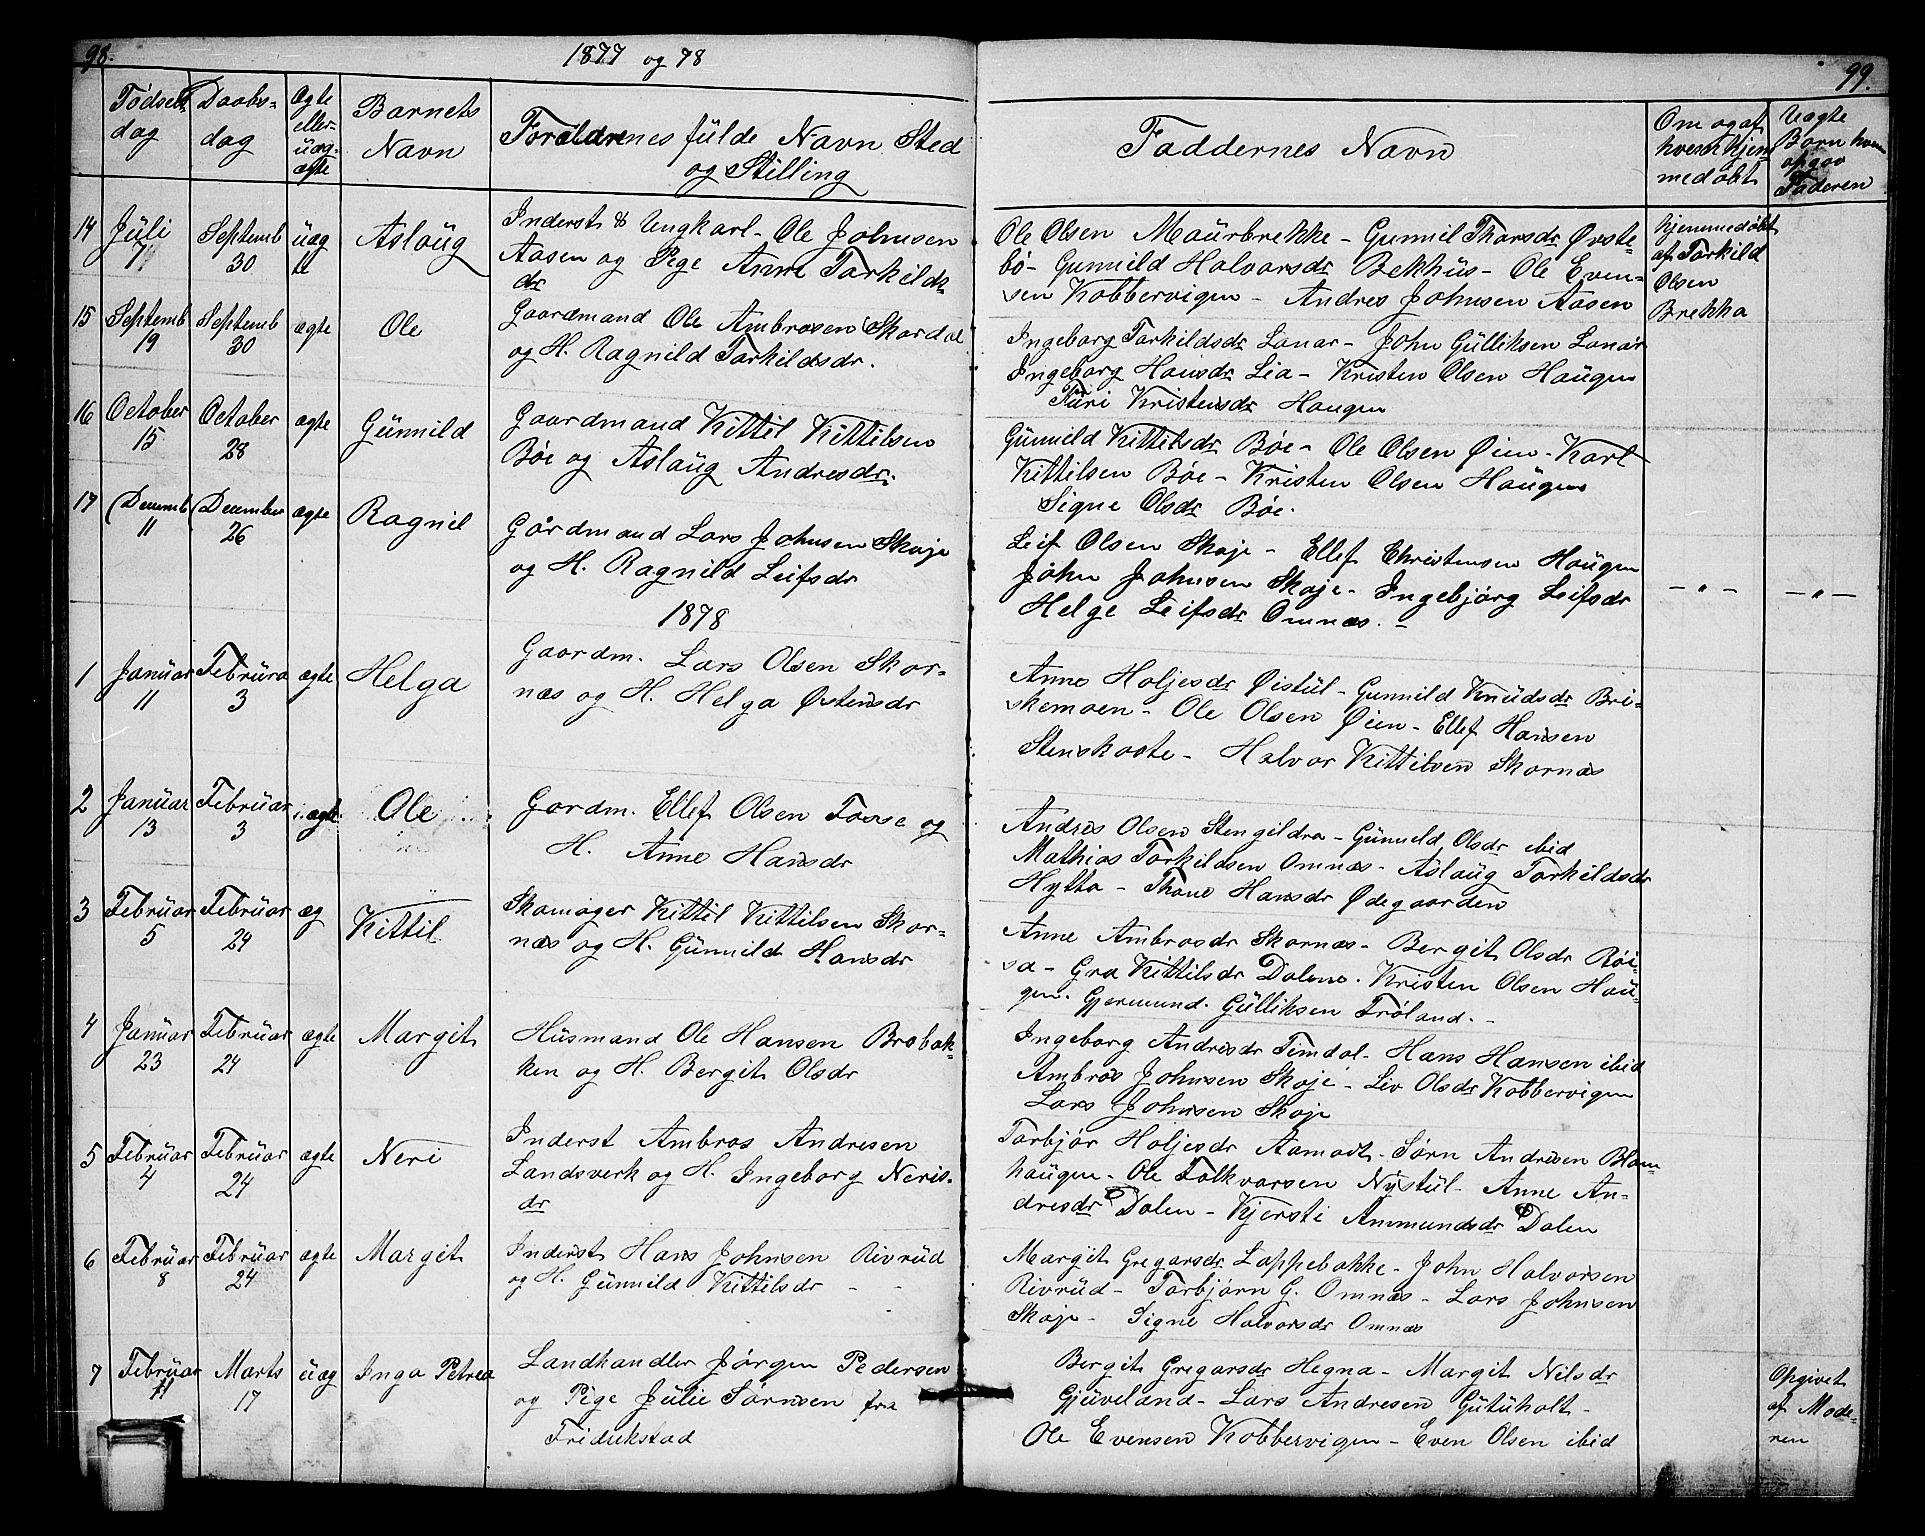 SAKO, Hjartdal kirkebøker, G/Gb/L0002: Klokkerbok nr. II 2, 1854-1884, s. 98-99